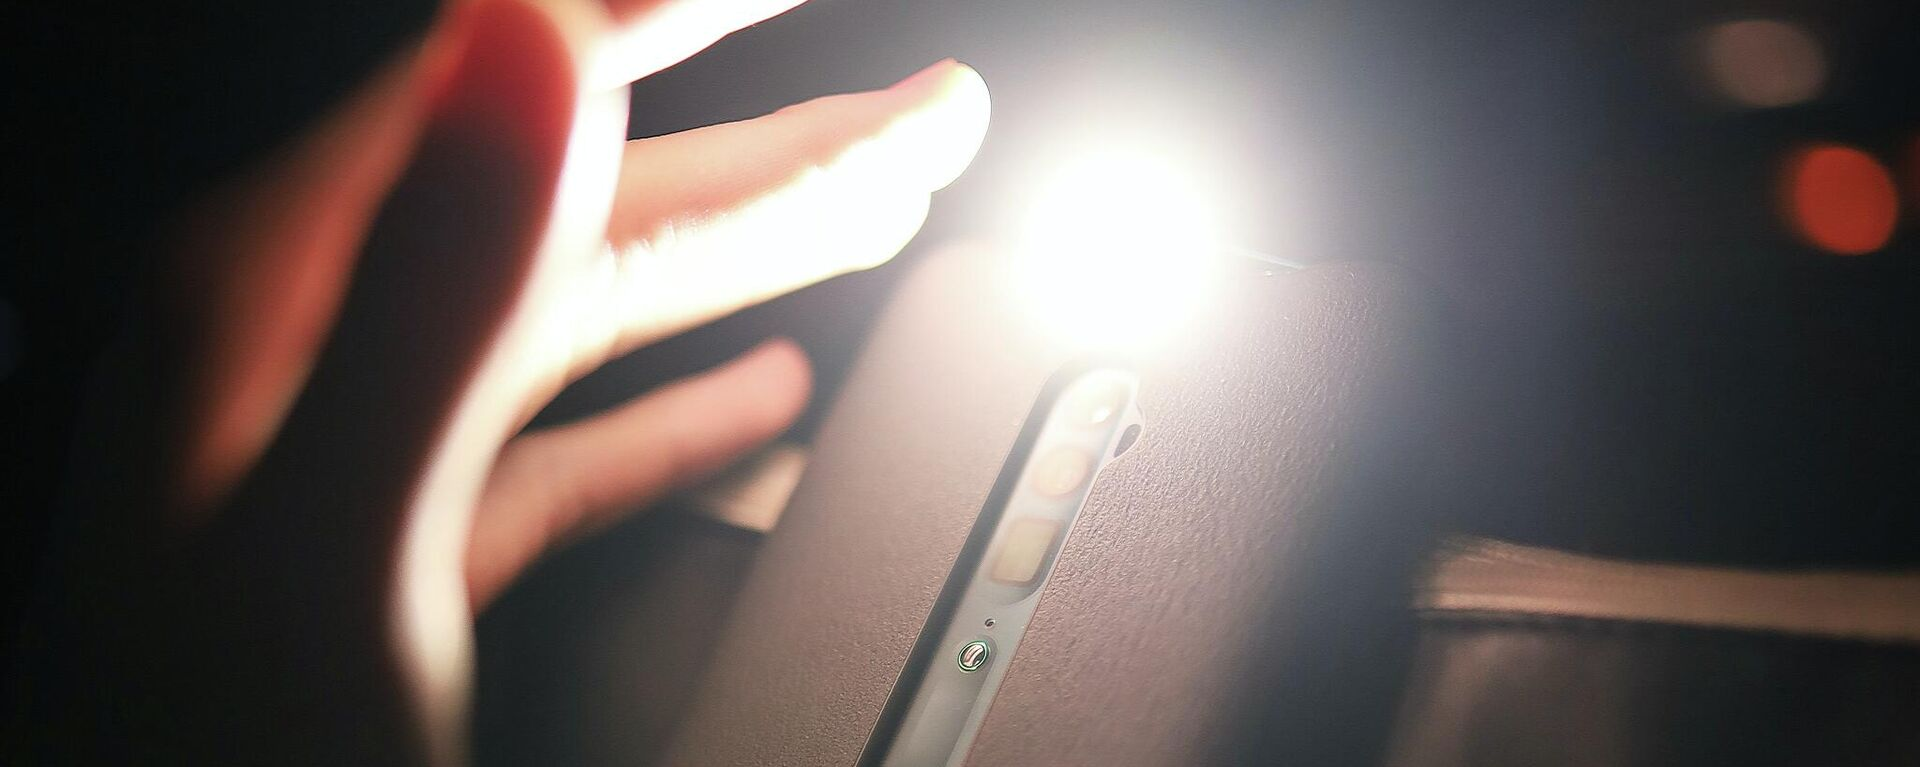 Una linterna en el smartphone - Sputnik Mundo, 1920, 20.09.2021